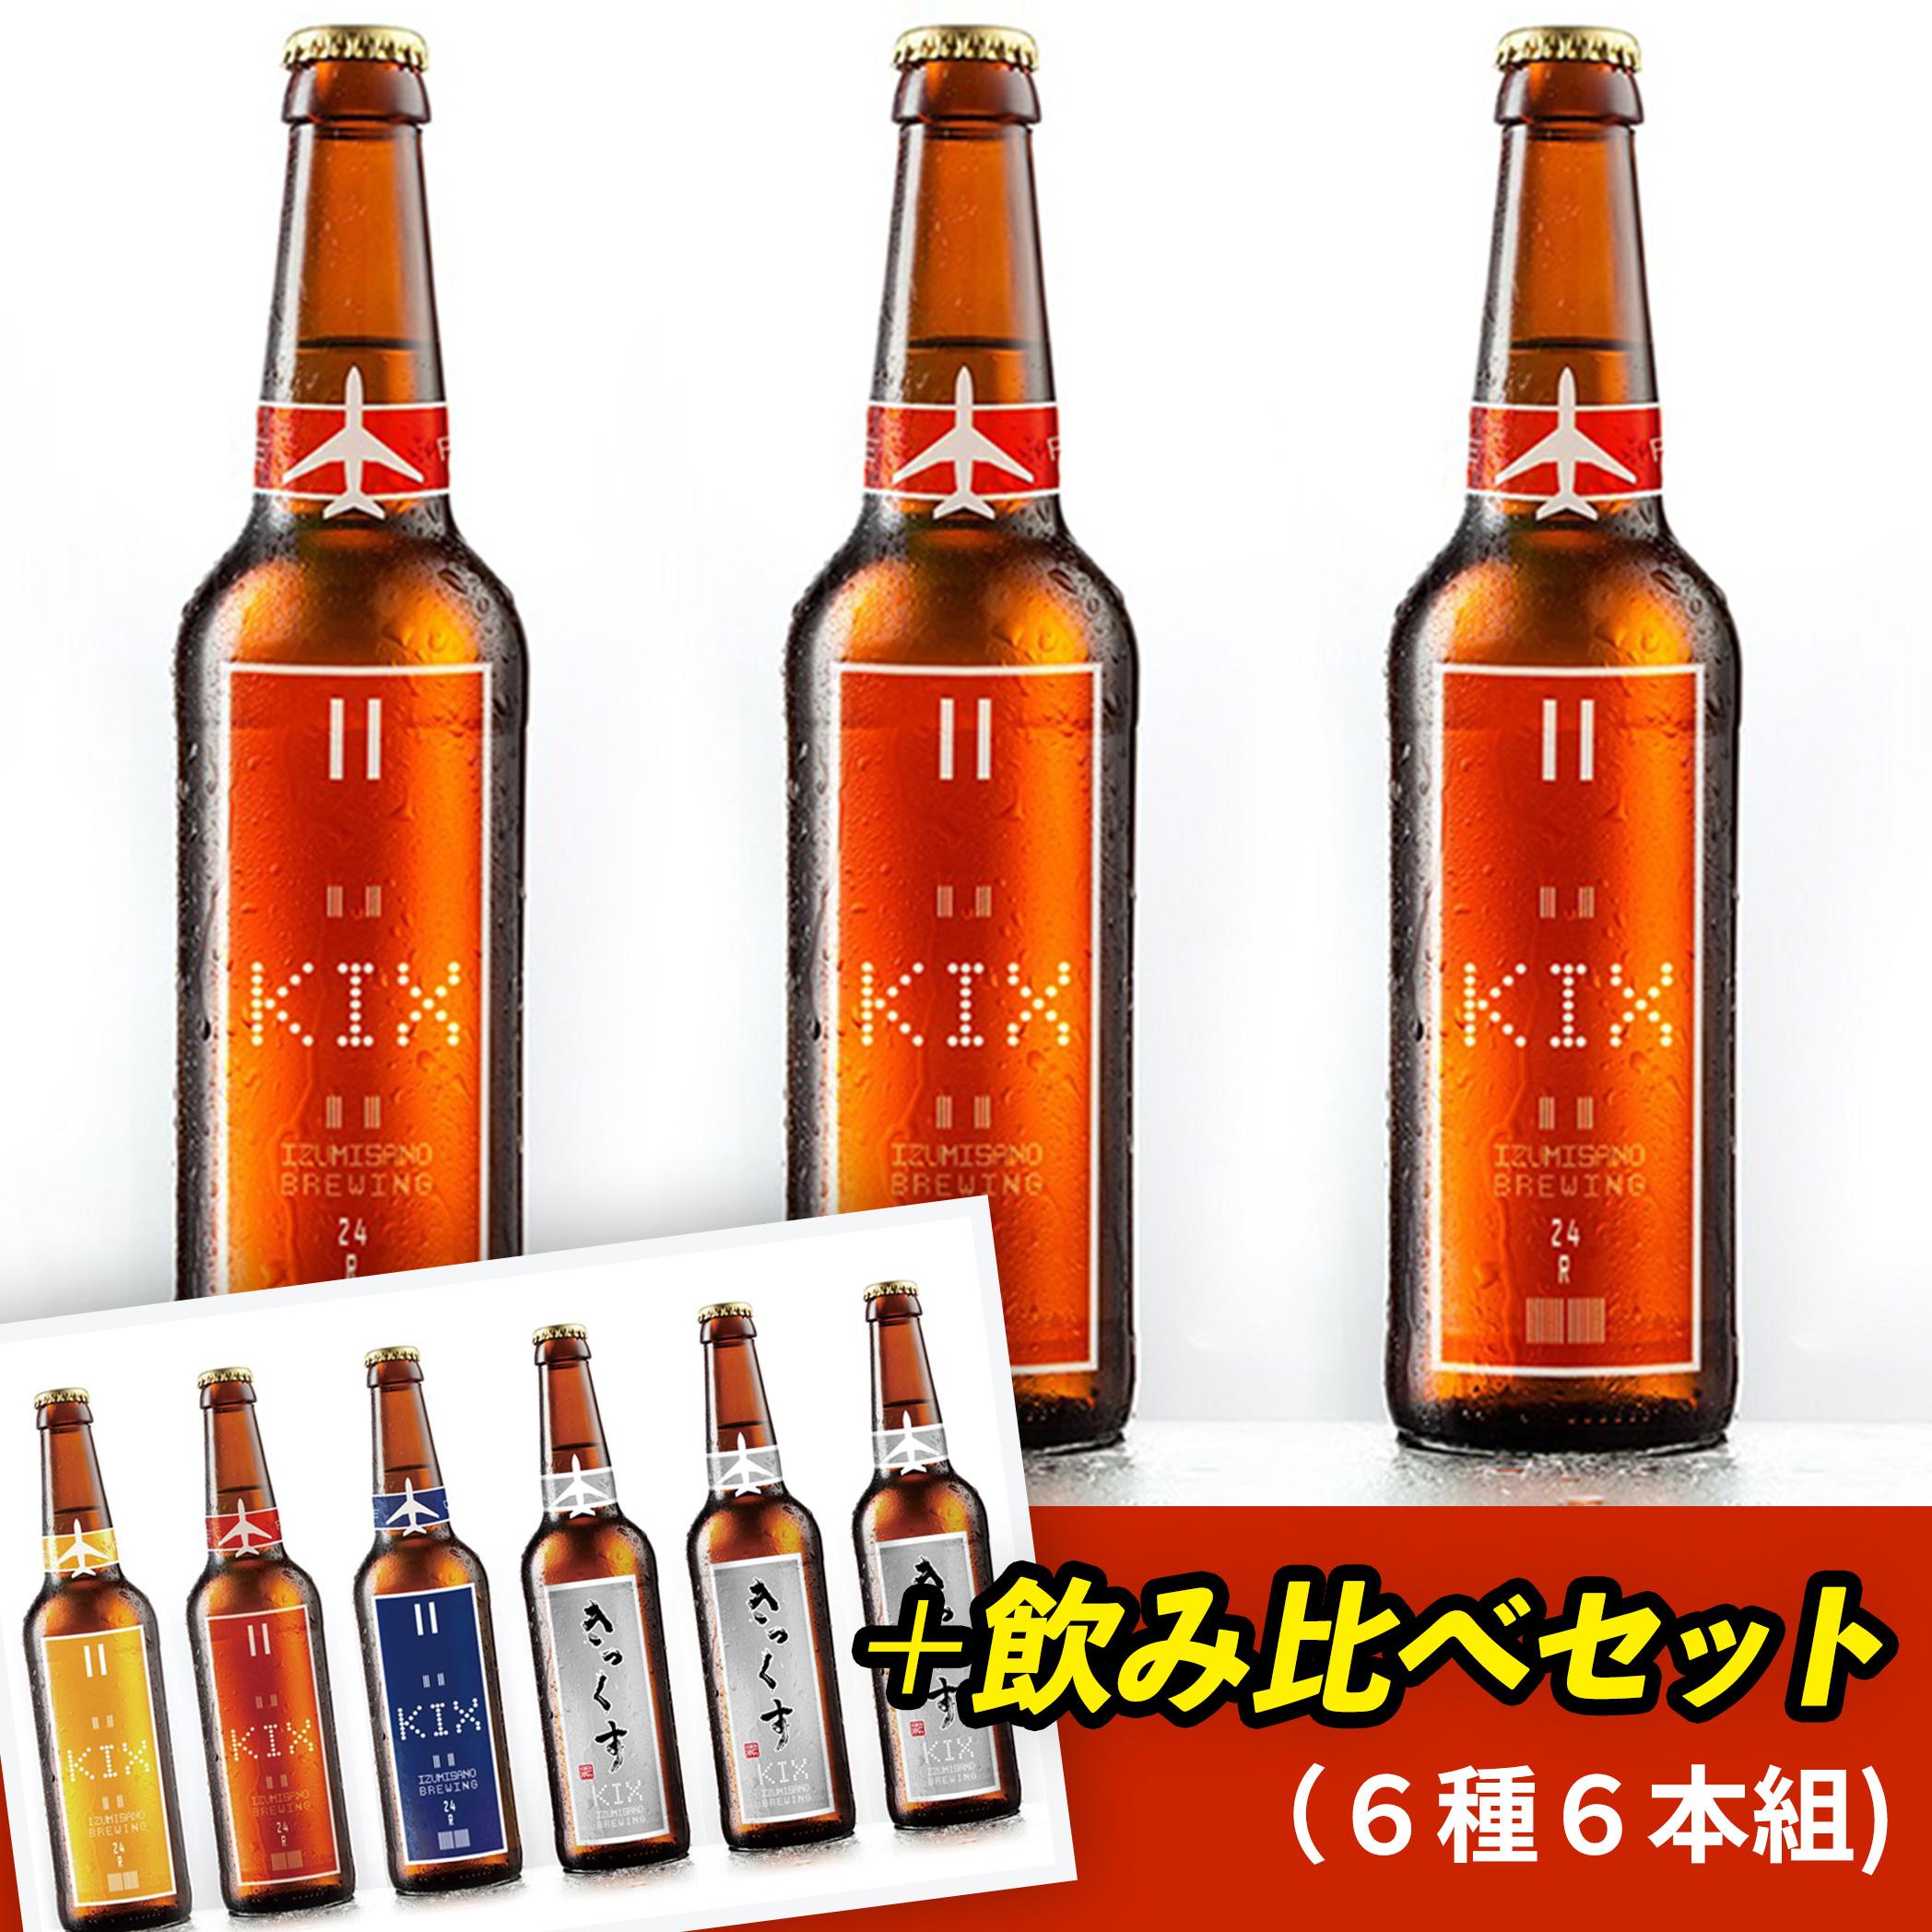 020C091 【期間限定】KIX BEER飲み比べセット18本(アンバーエール12本+6種6本)